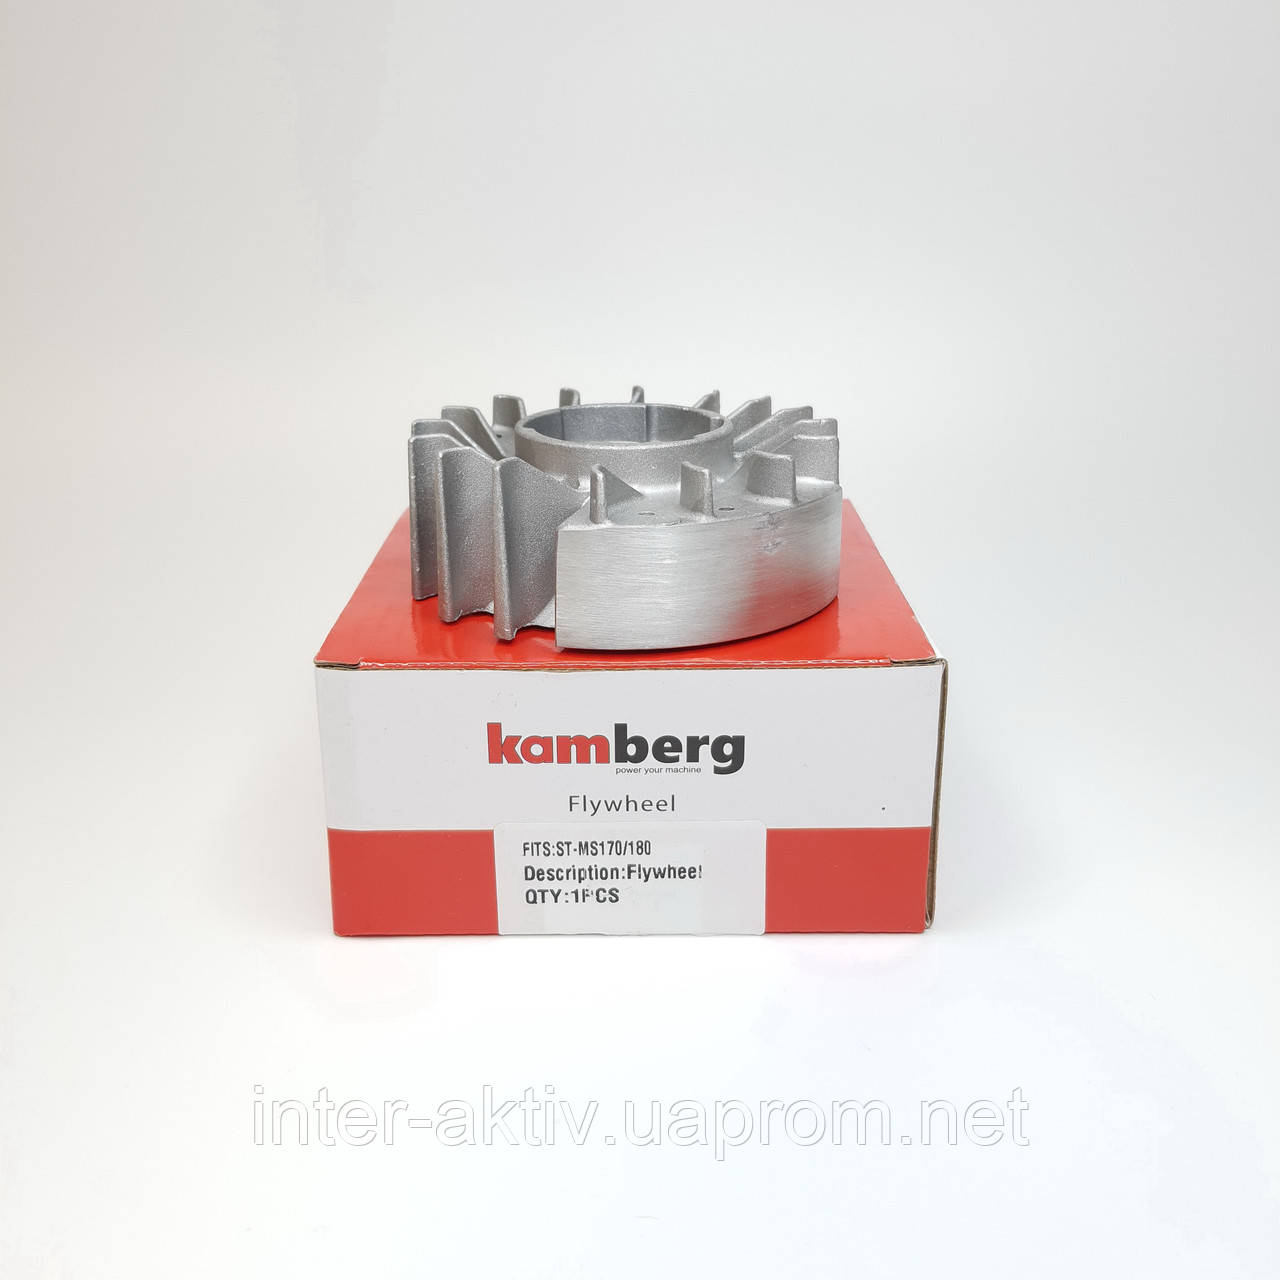 Маховик для бензопили STIHL 180 Kamberg